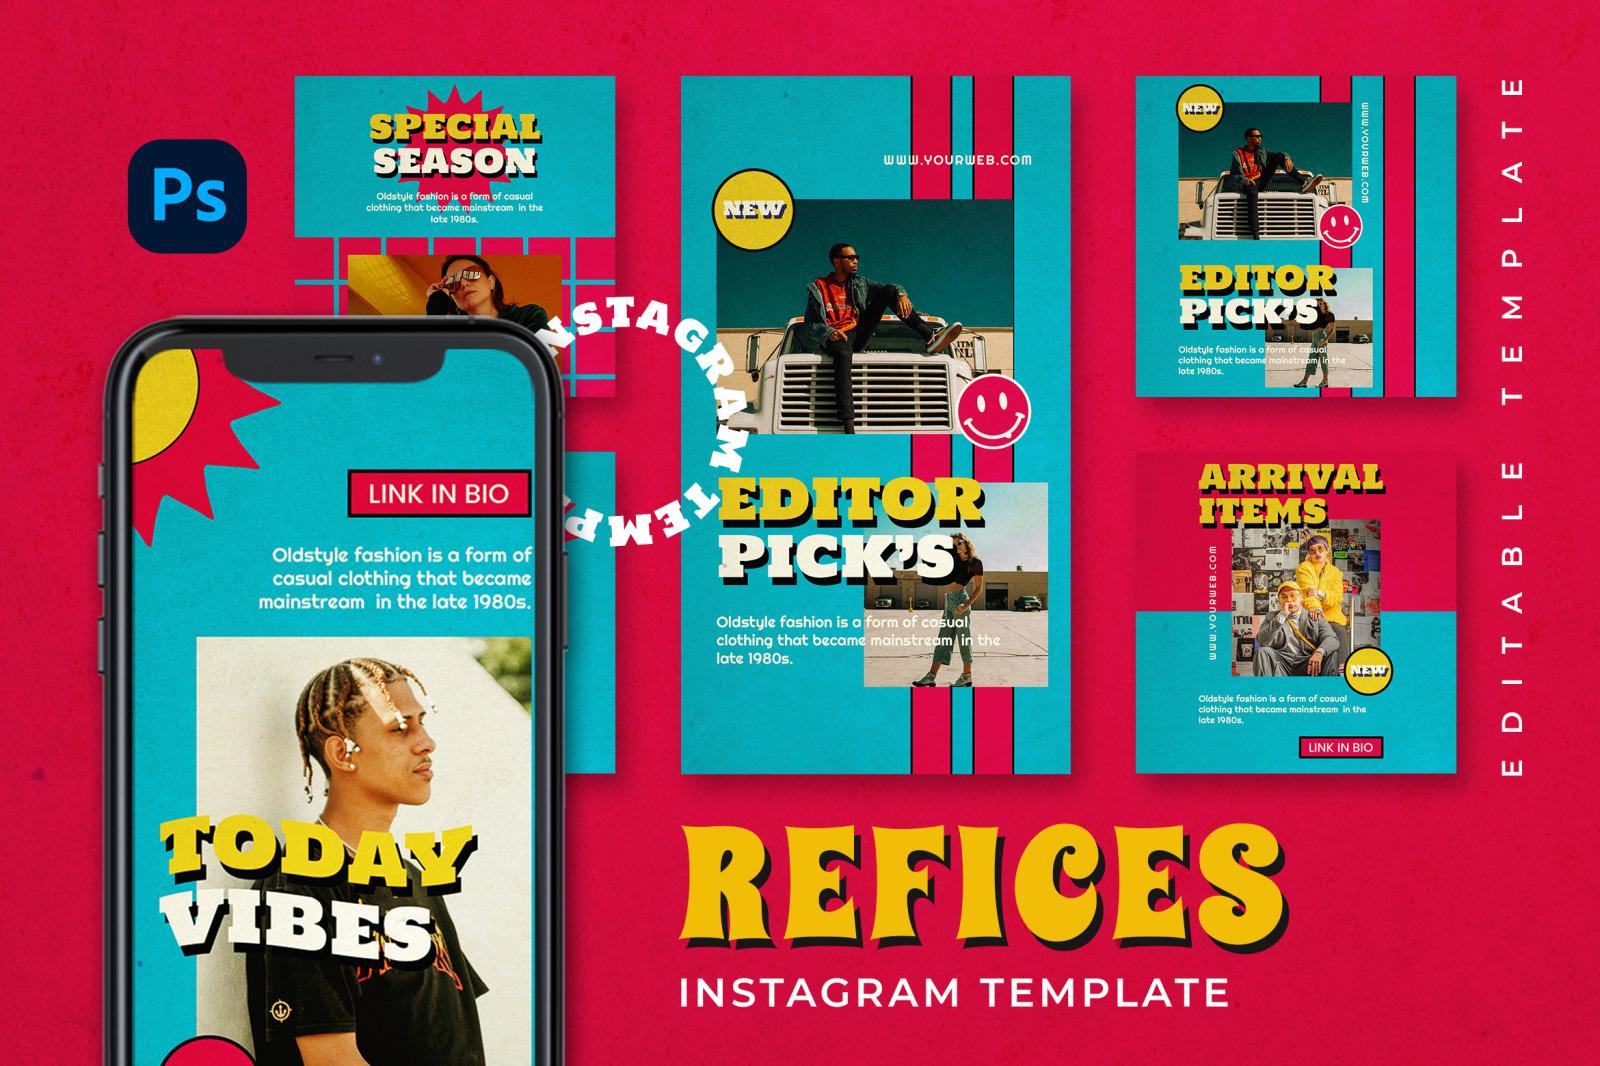 Refices Instagram Template